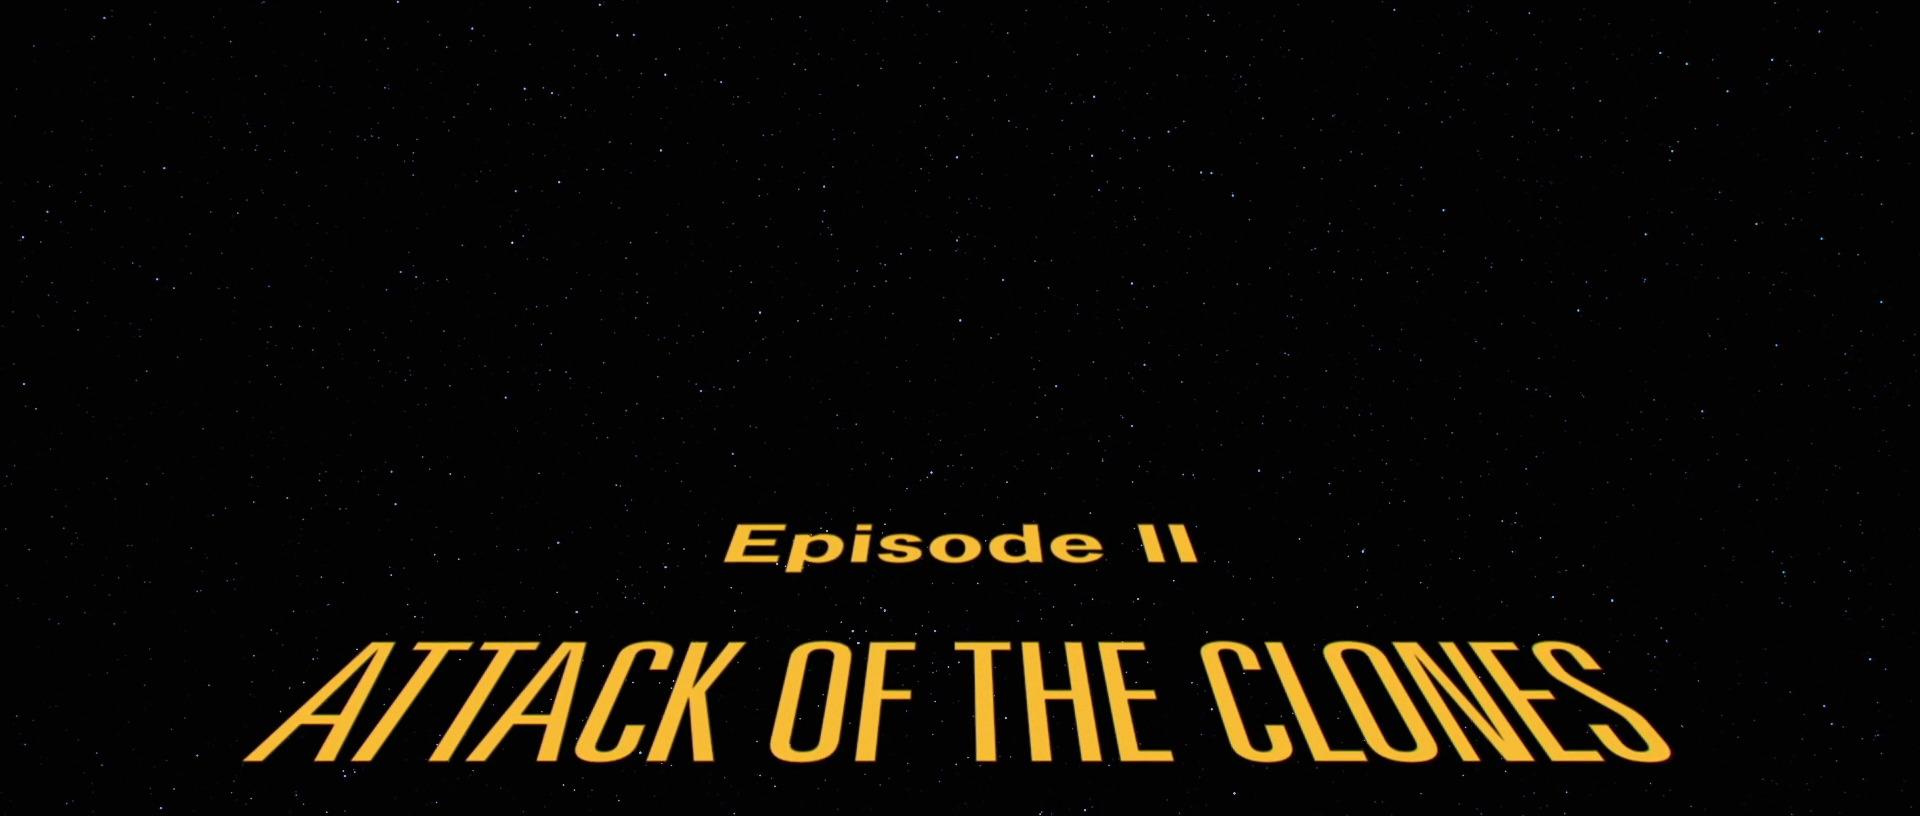 Star Wars Episode II: Attack of the Clones (2002)